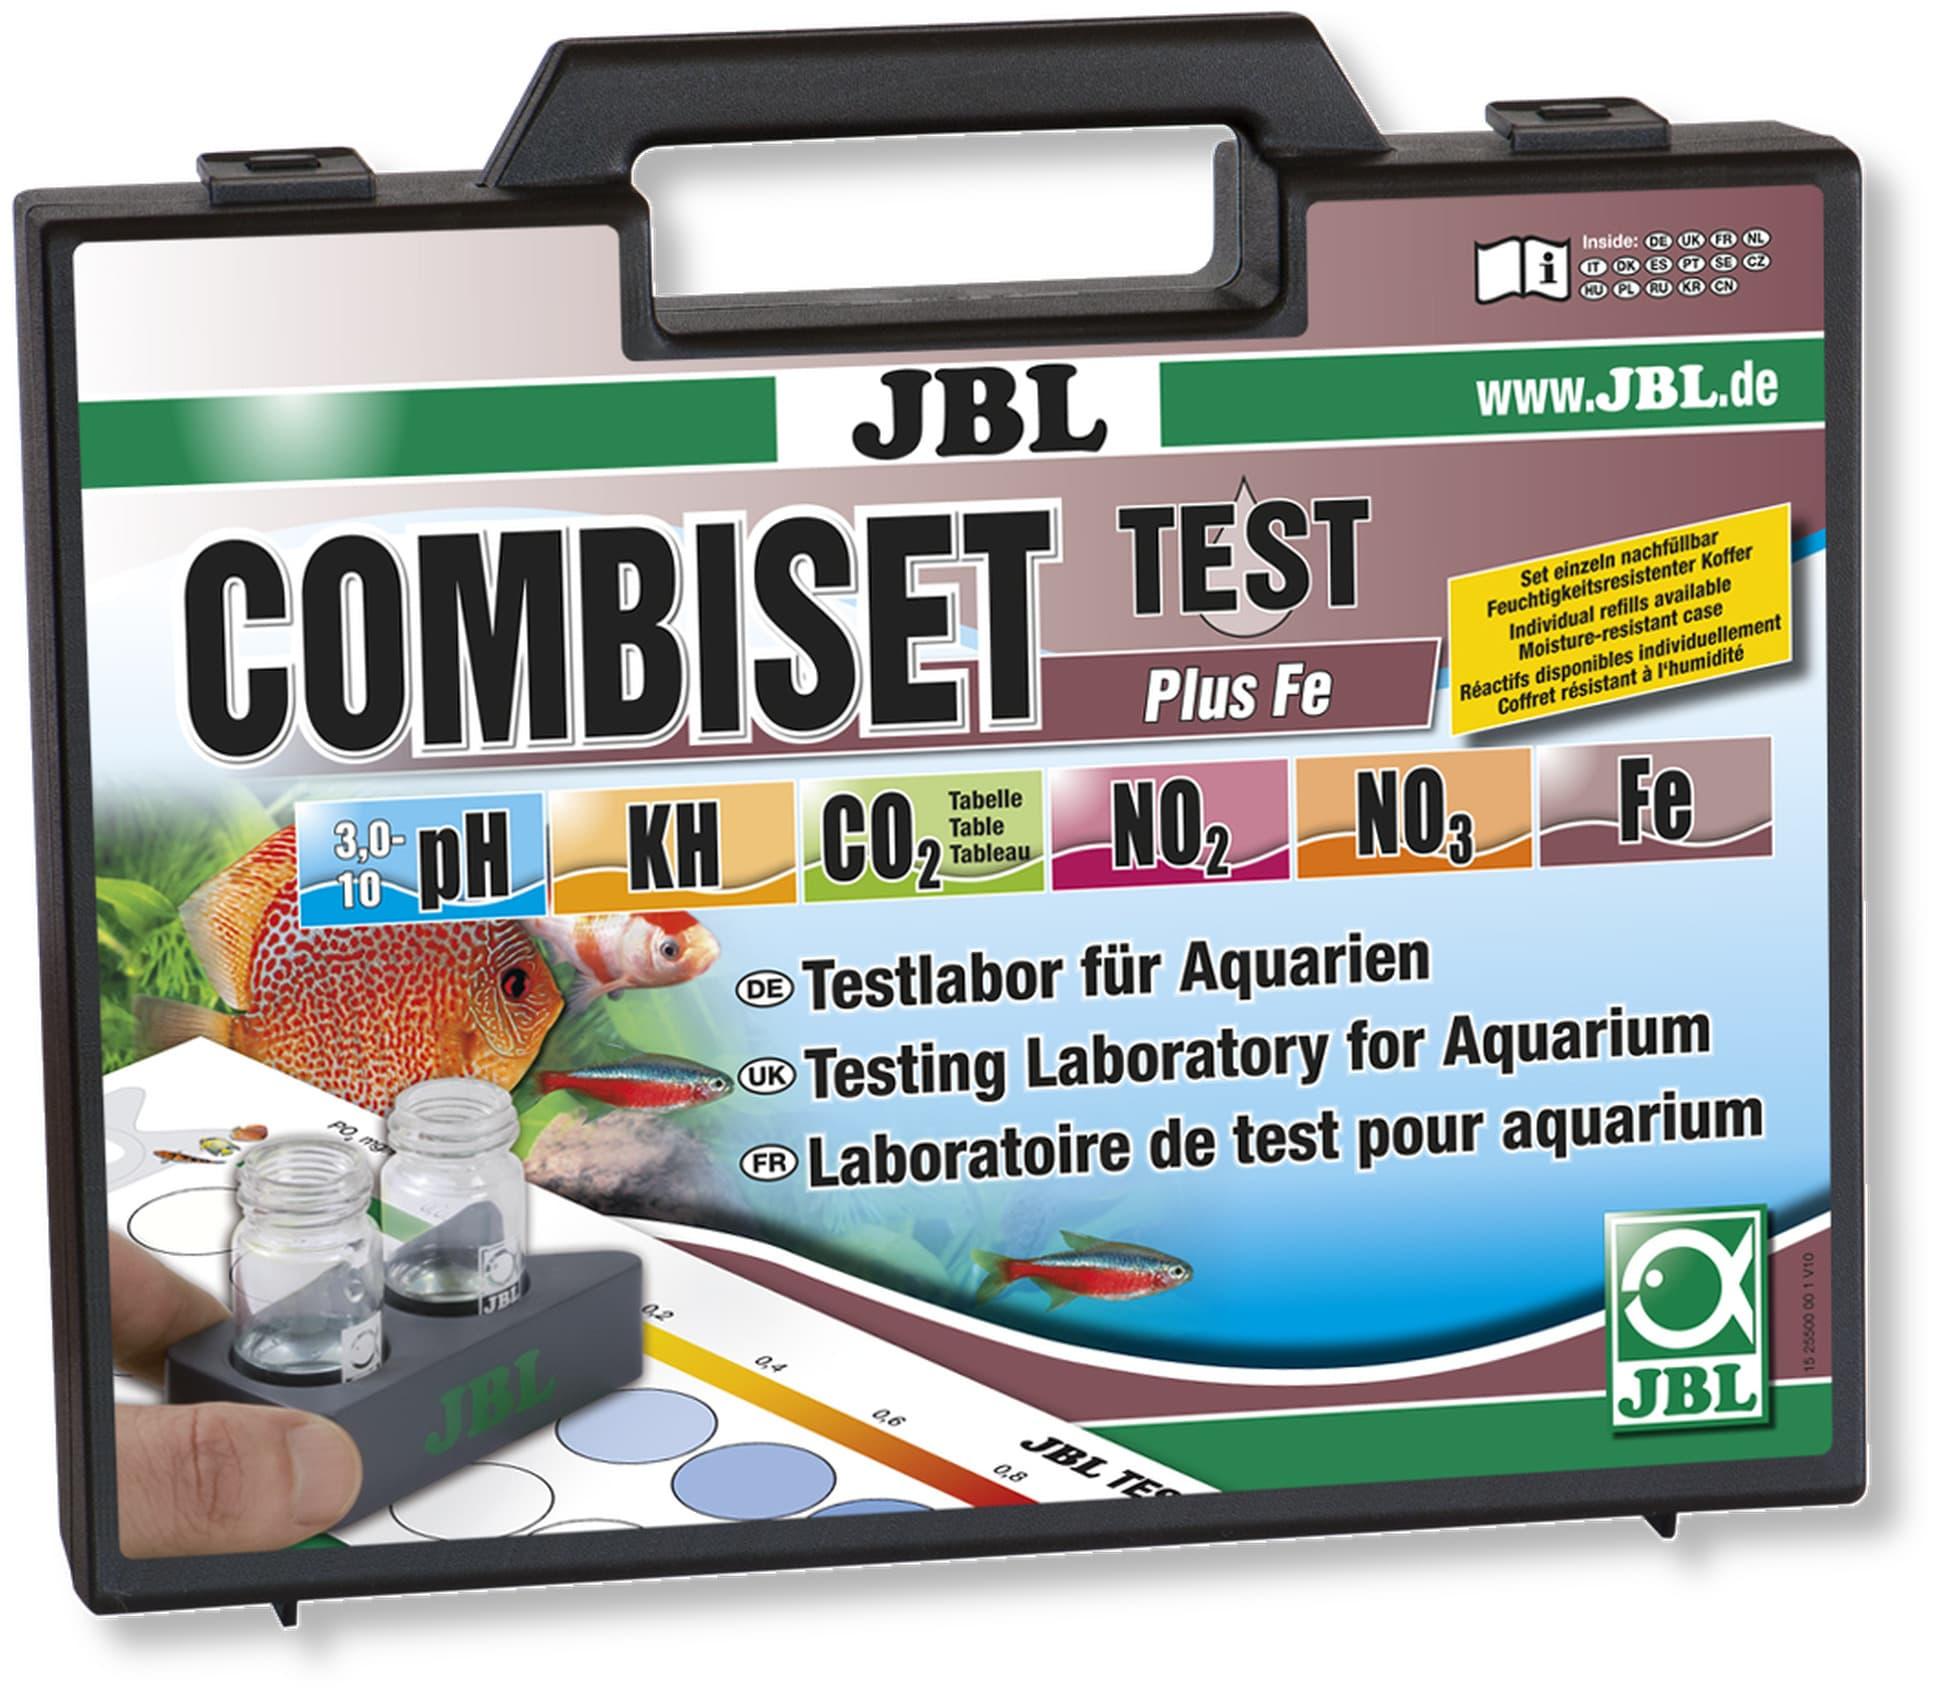 jbl-combiset-malette-de-tests-complete-pour-analyse-du-ph-fer-kh-no2-n03-min